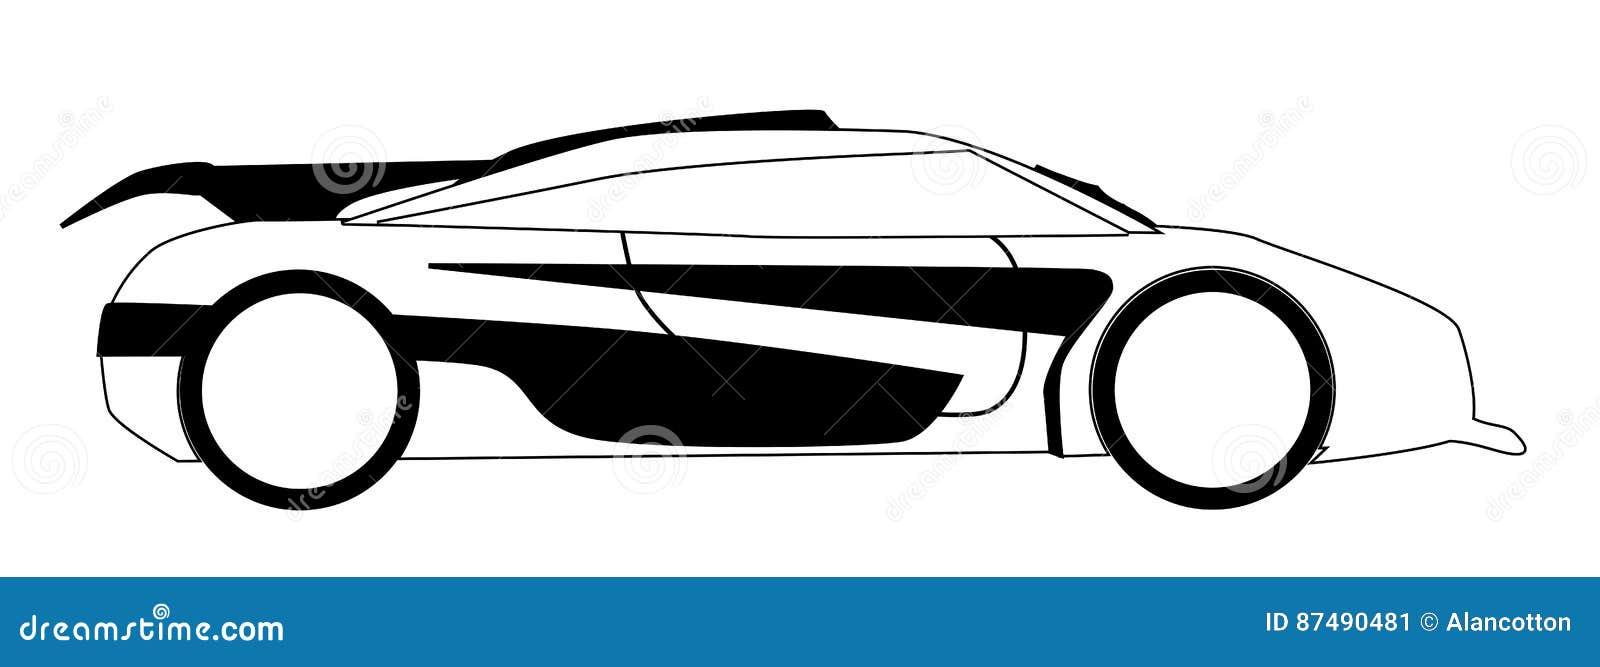 Modern Fast Car Outline stock vector. Illustration of